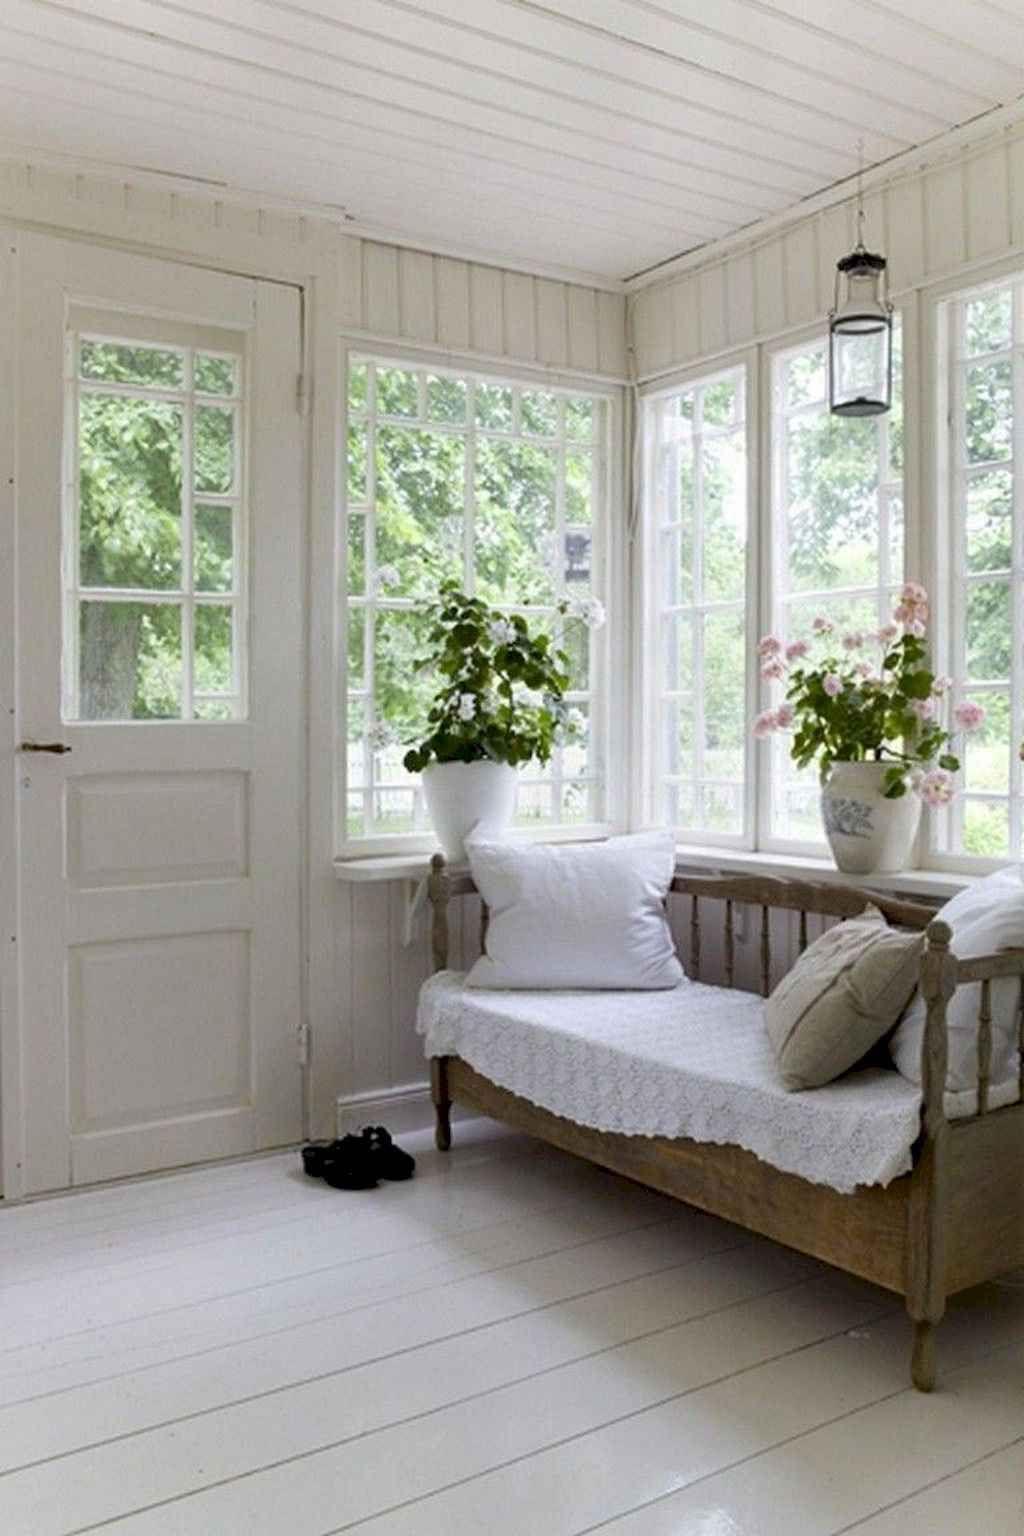 25 Cozy Modern Farmhouse Sunroom Decor Ideas - Gladecor.com